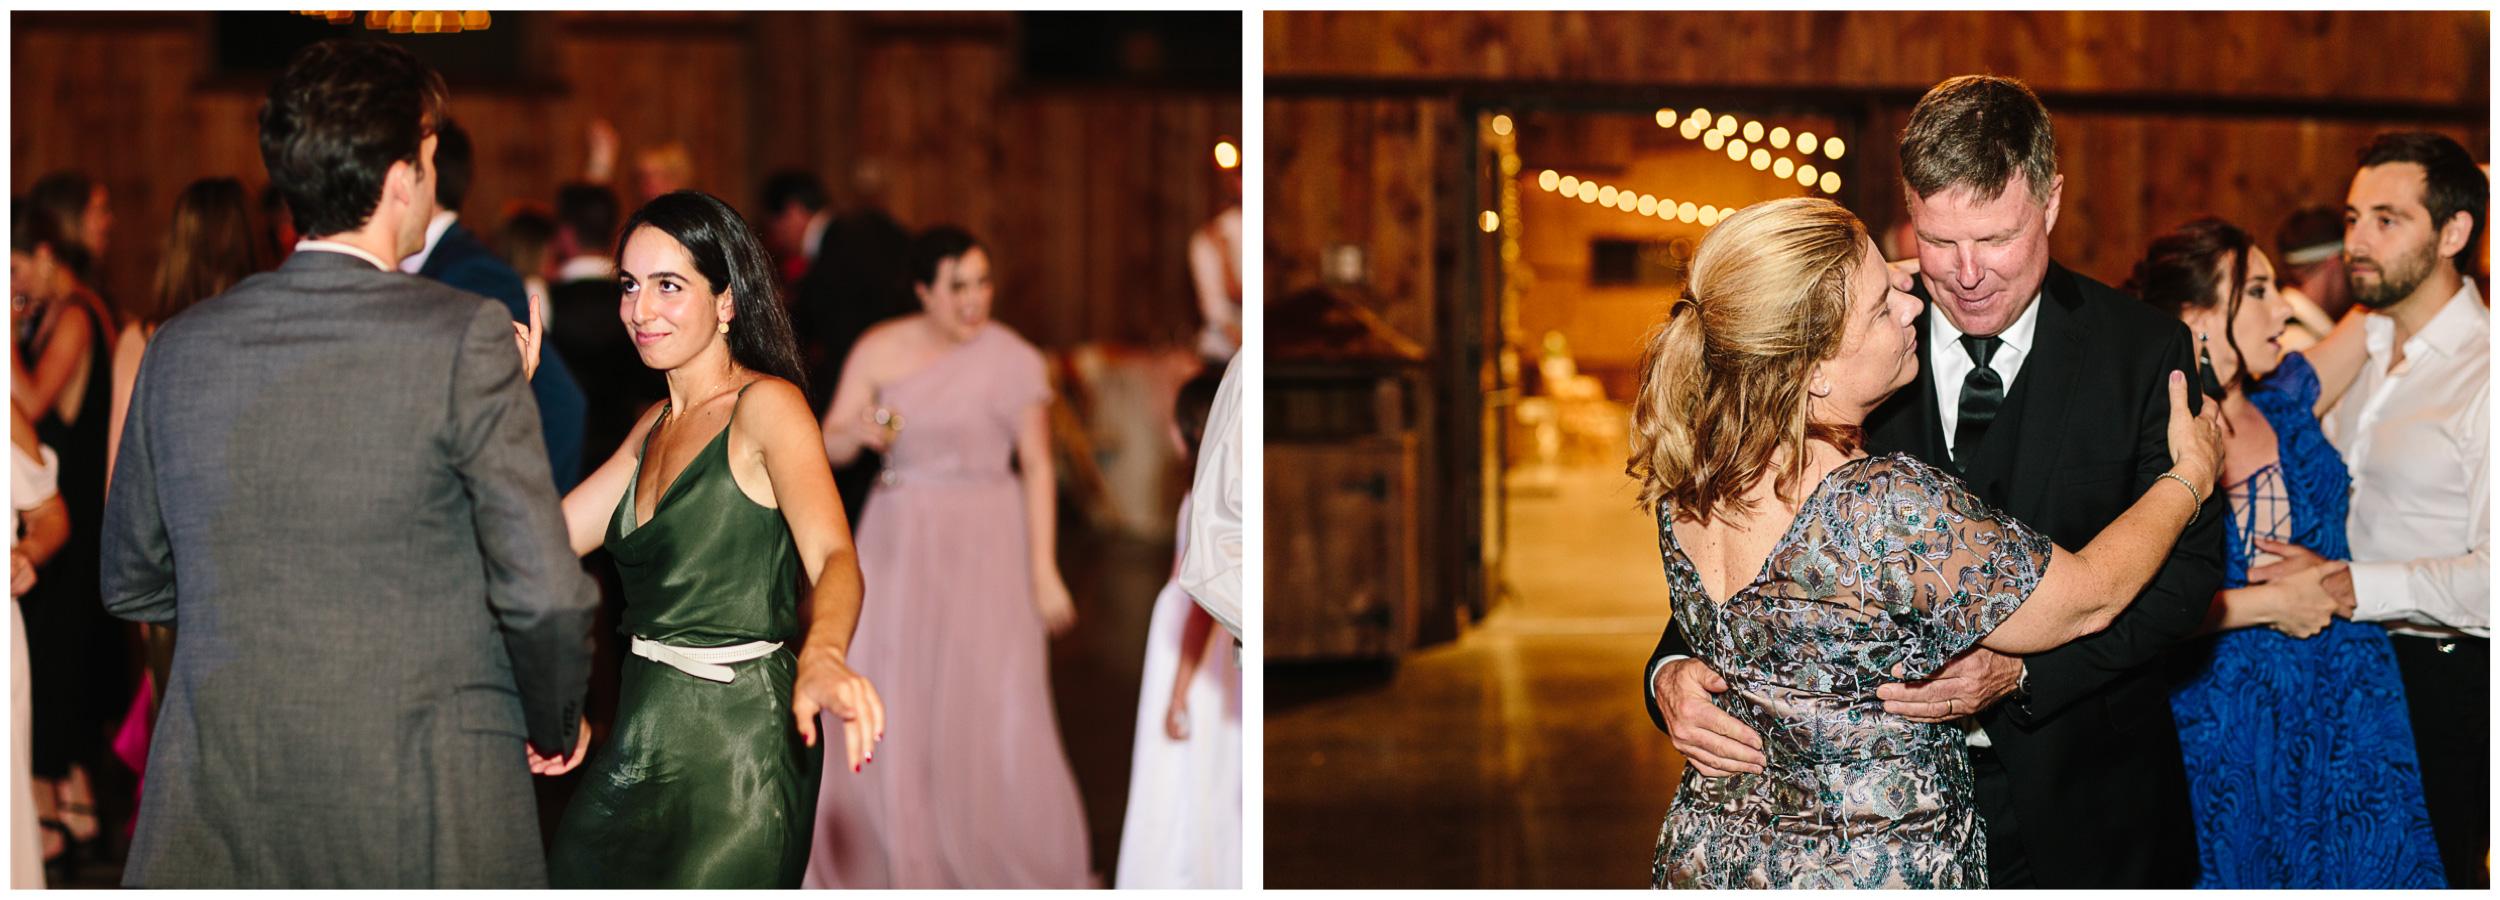 spruce_mountain_ranch_wedding_89.jpg